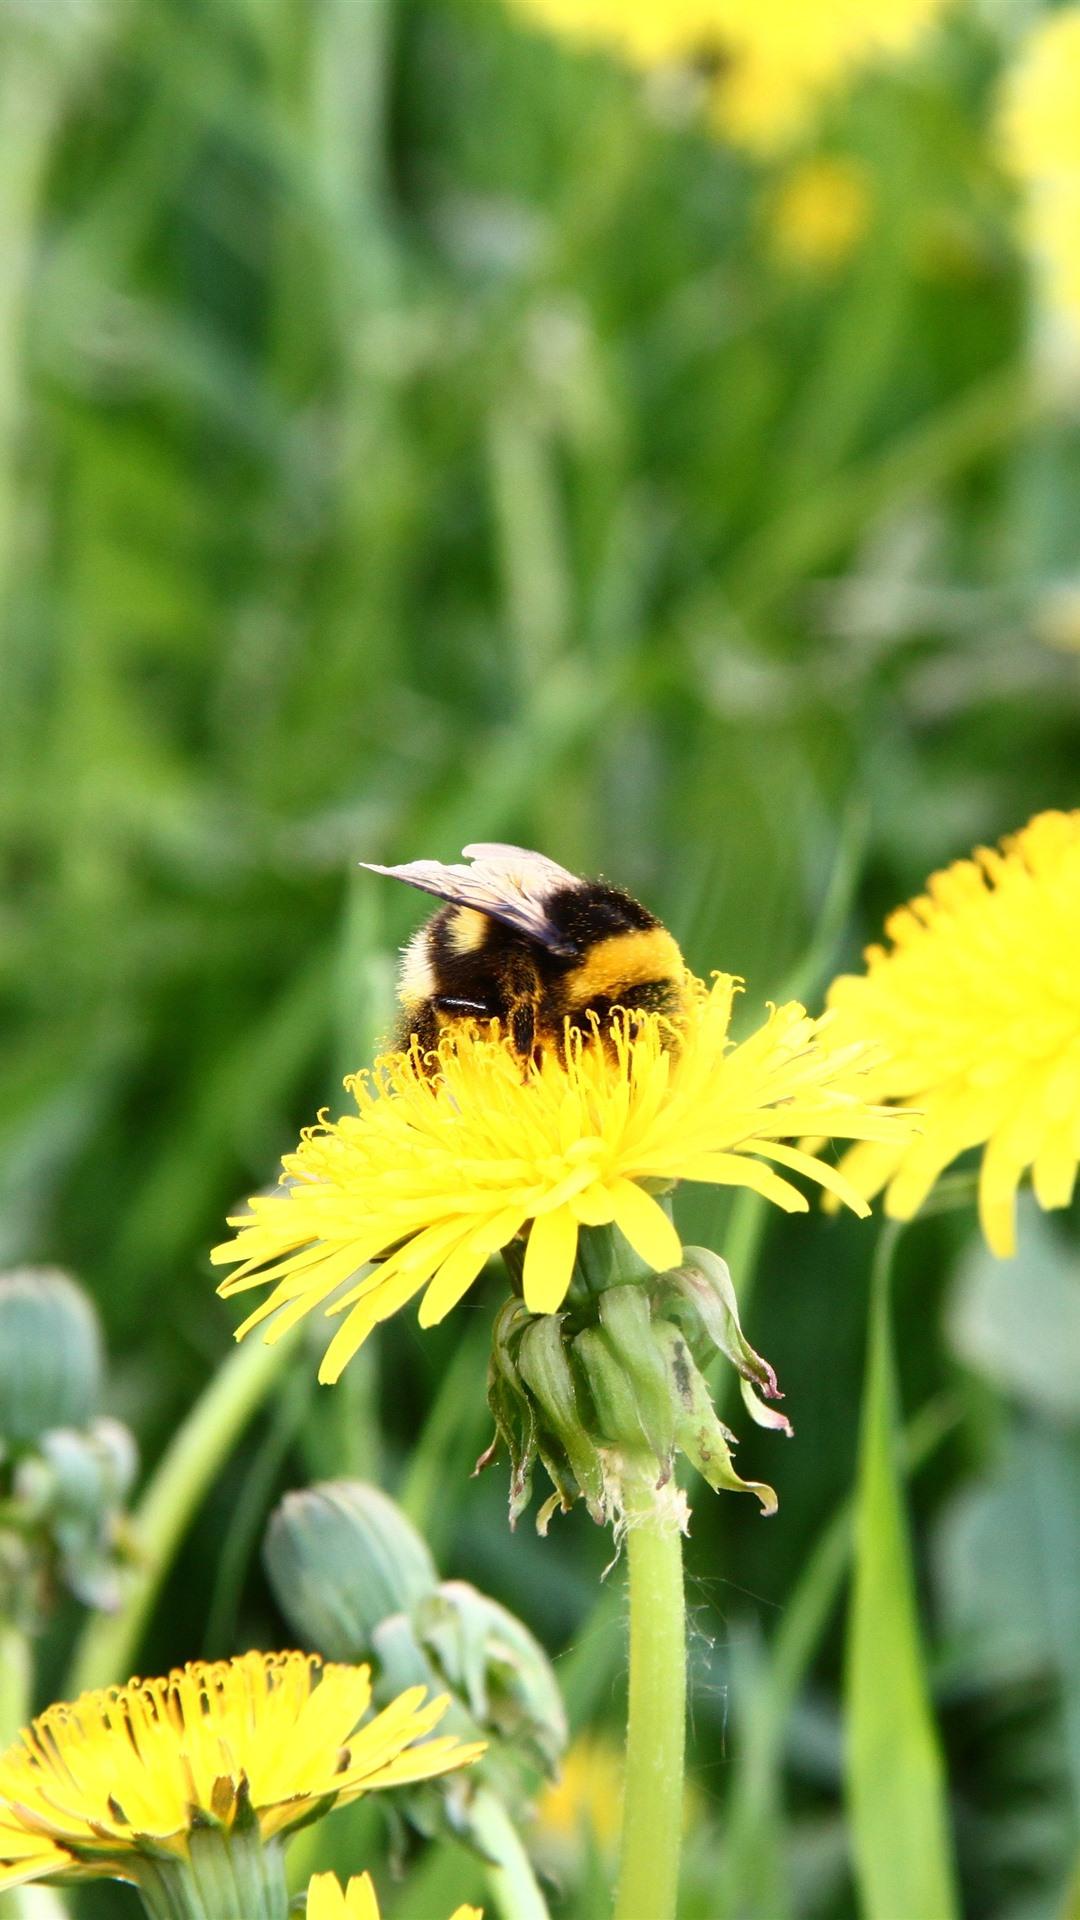 Bee Yellow Dandelion Flowers 1242x2688 Iphone Xs Max